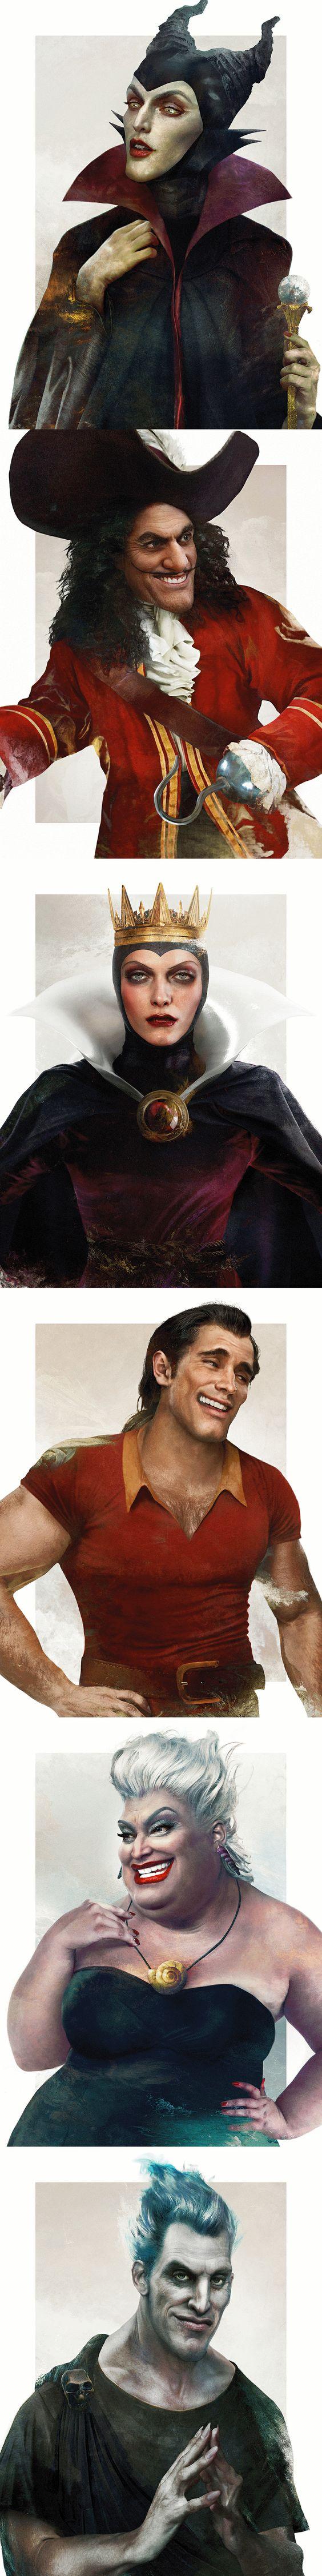 disney-villains-art-1